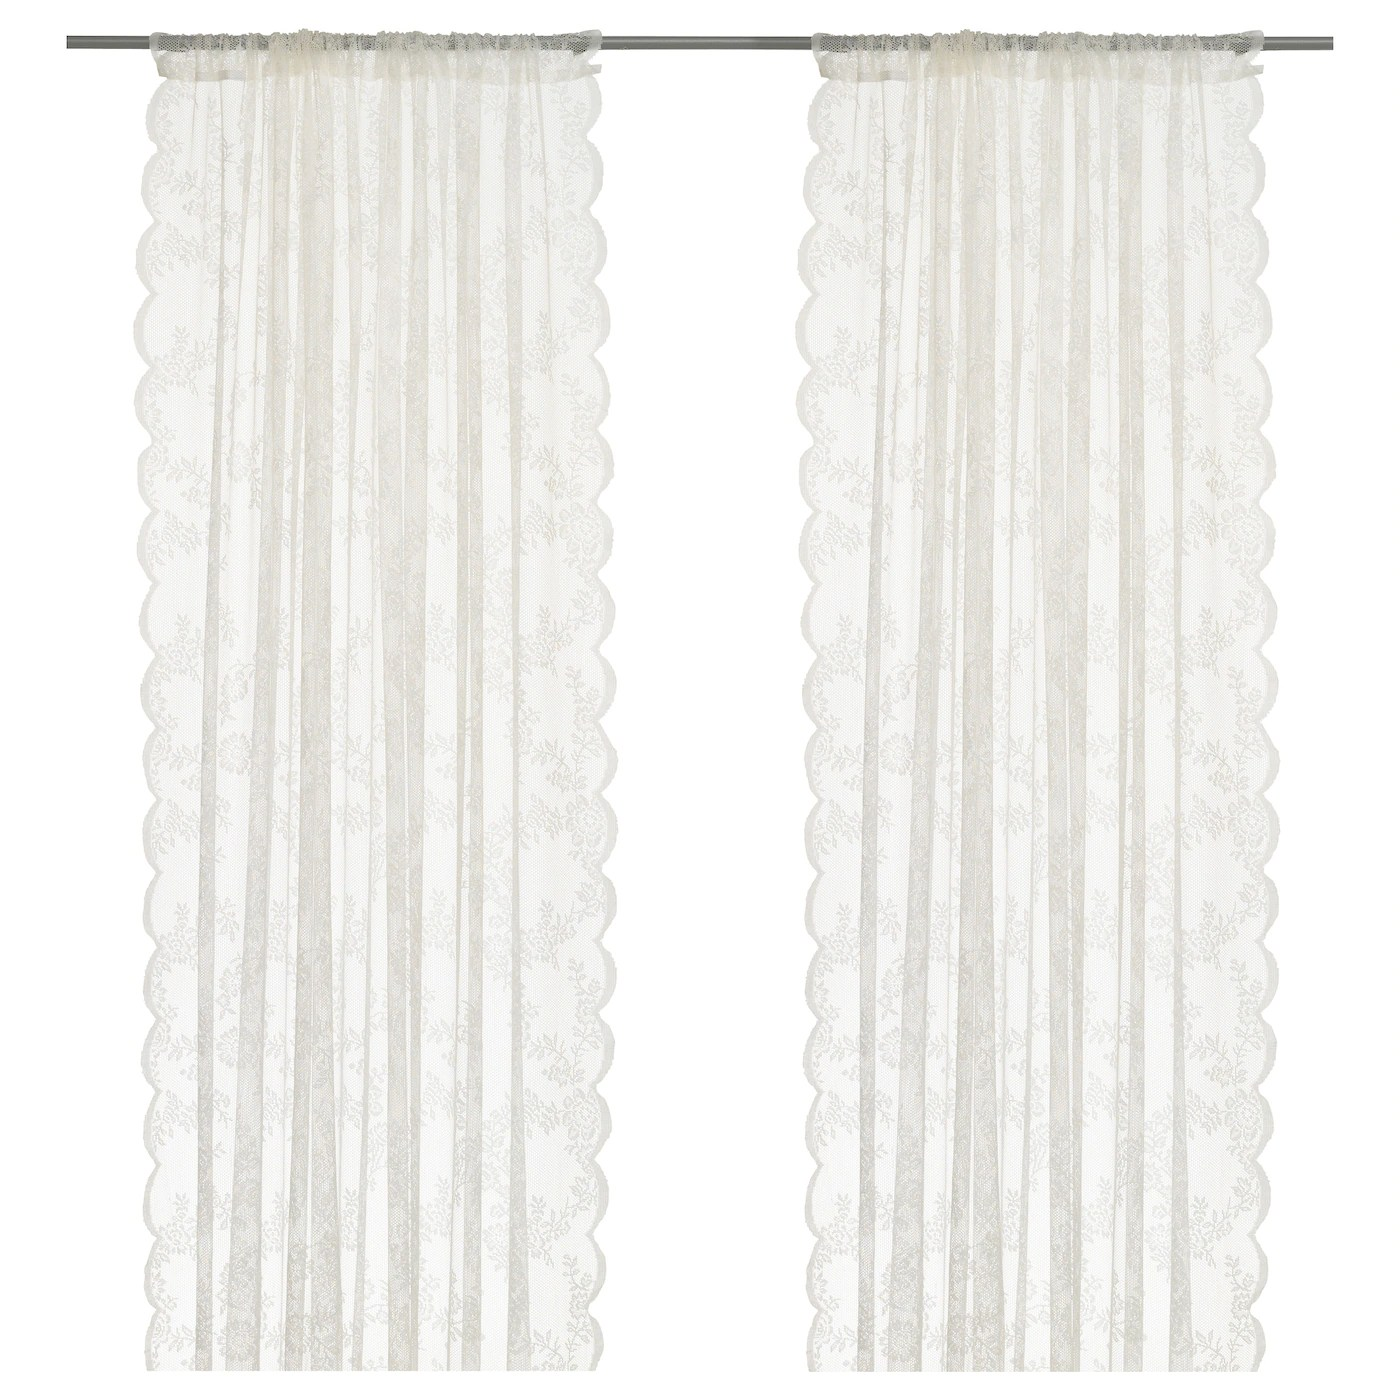 alvine spets lace curtains 1 pair off white 57x98